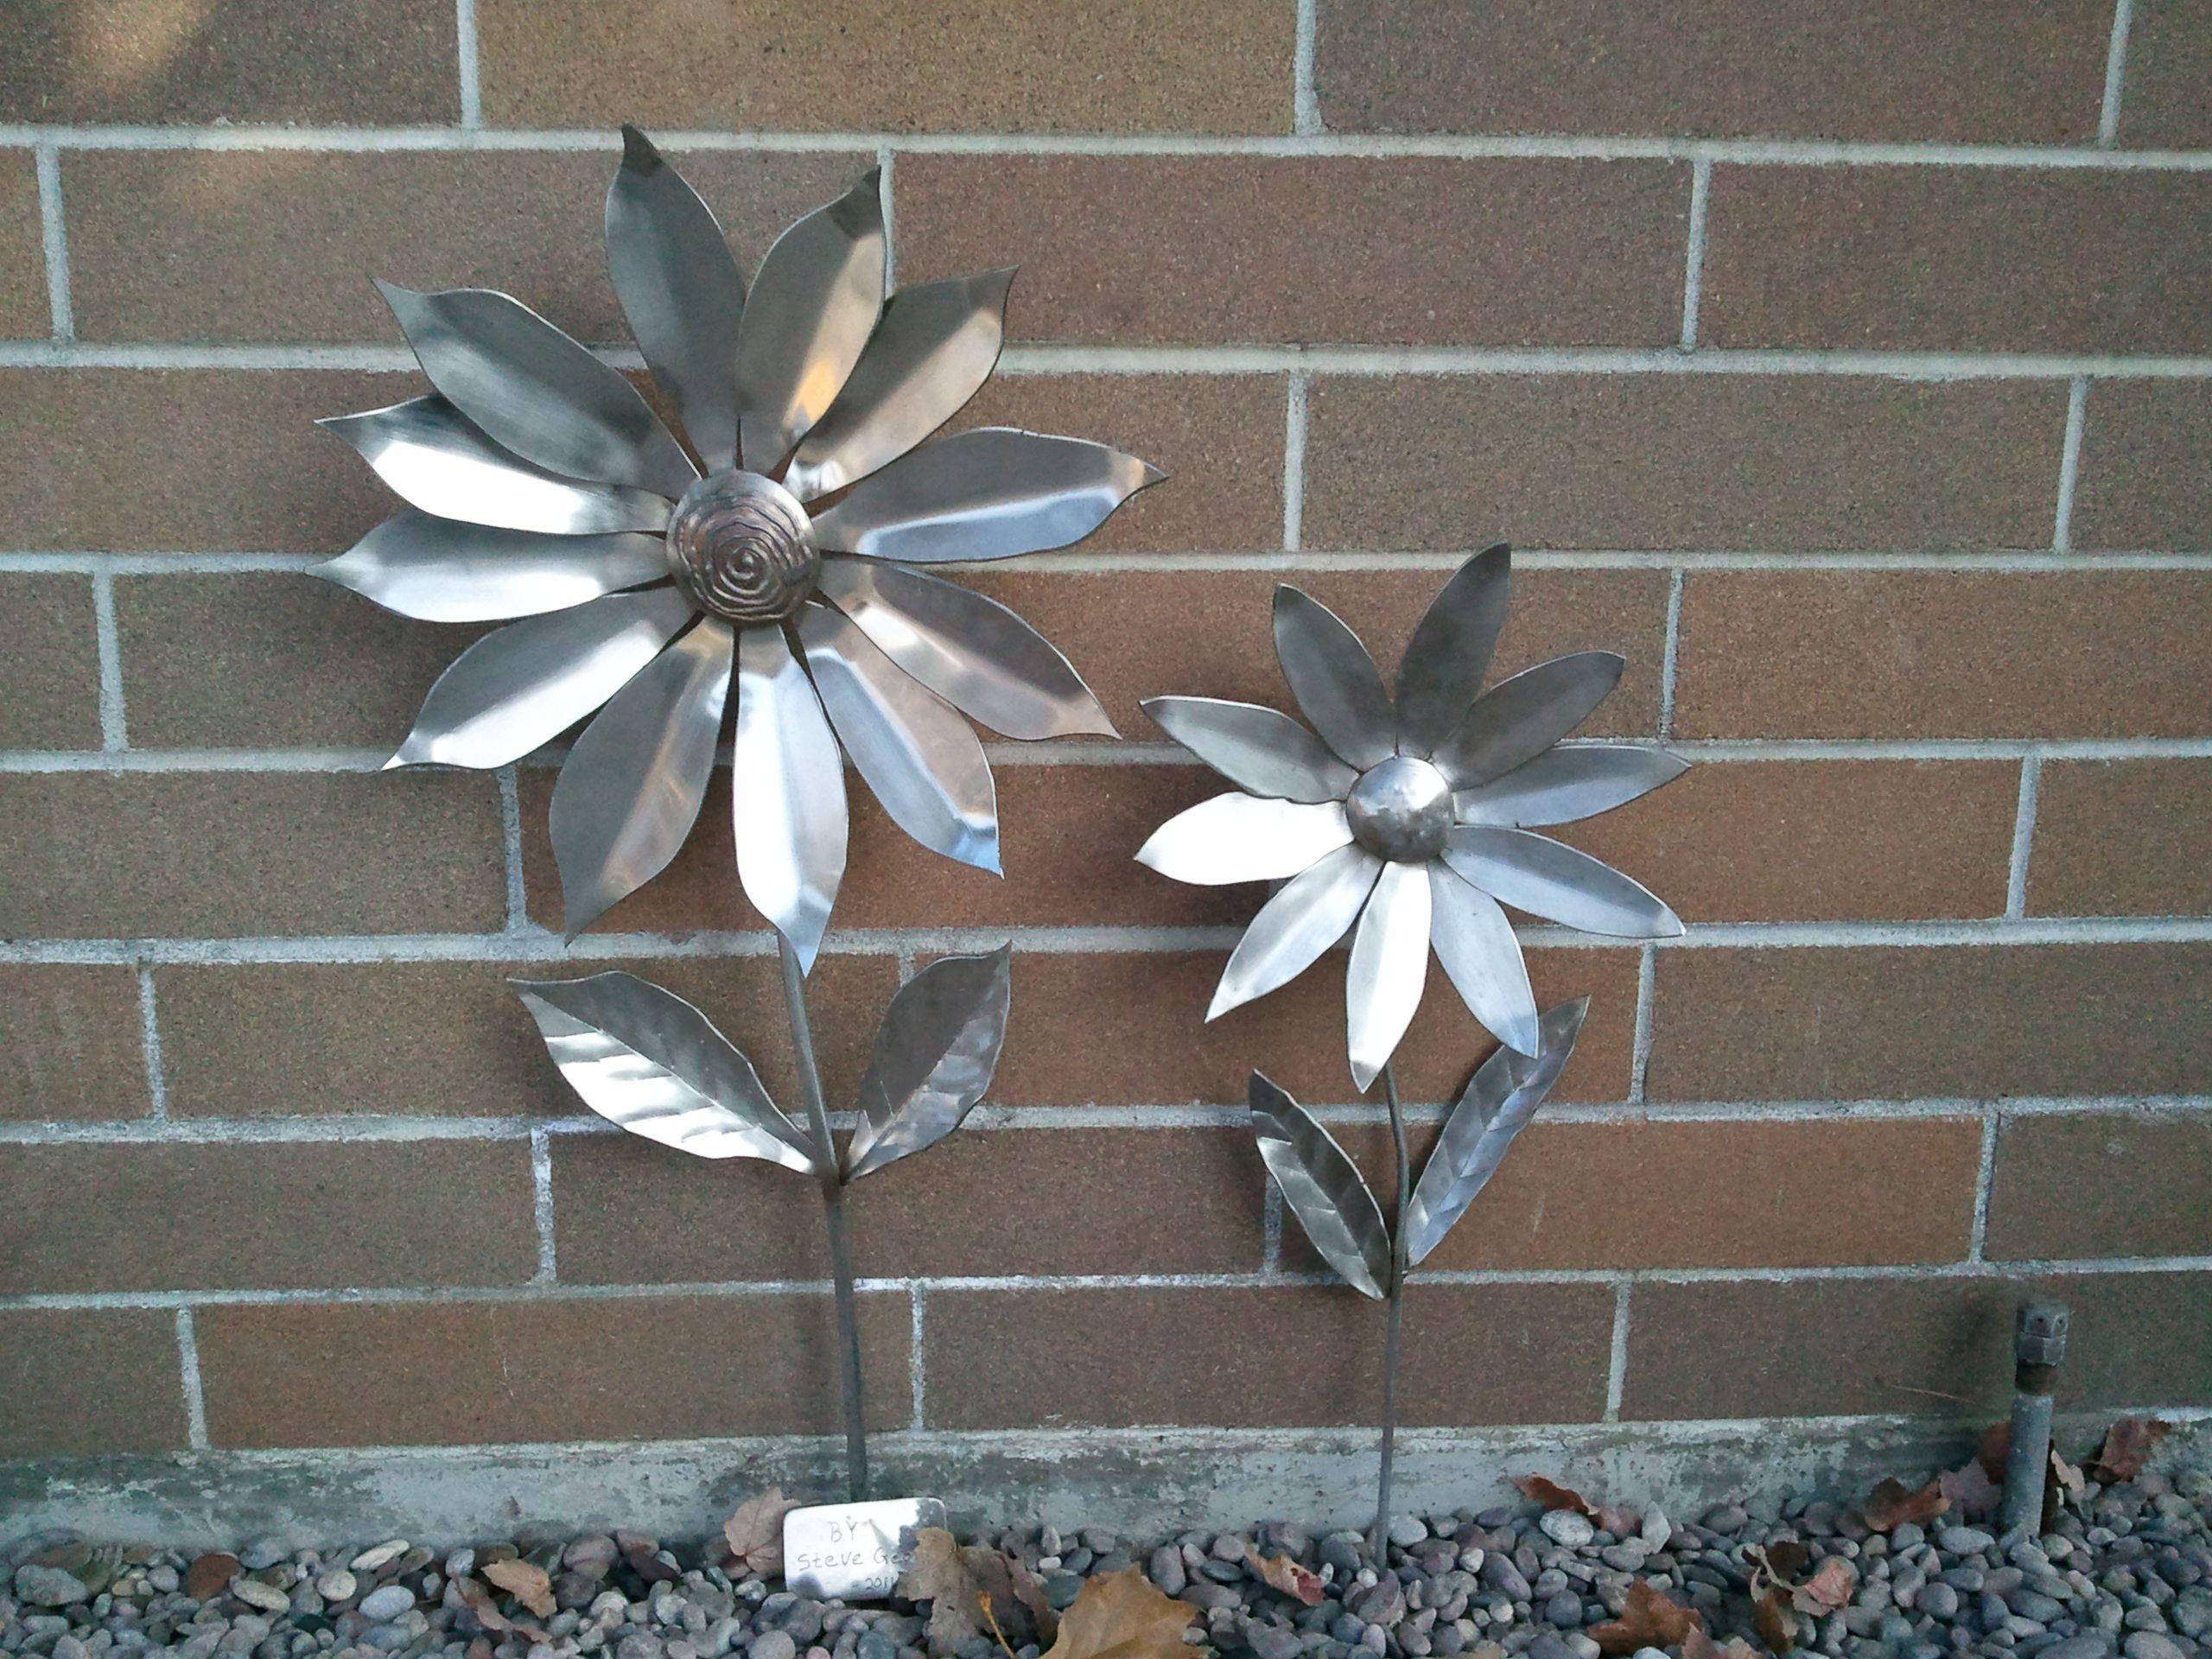 Stainless Steel flowers